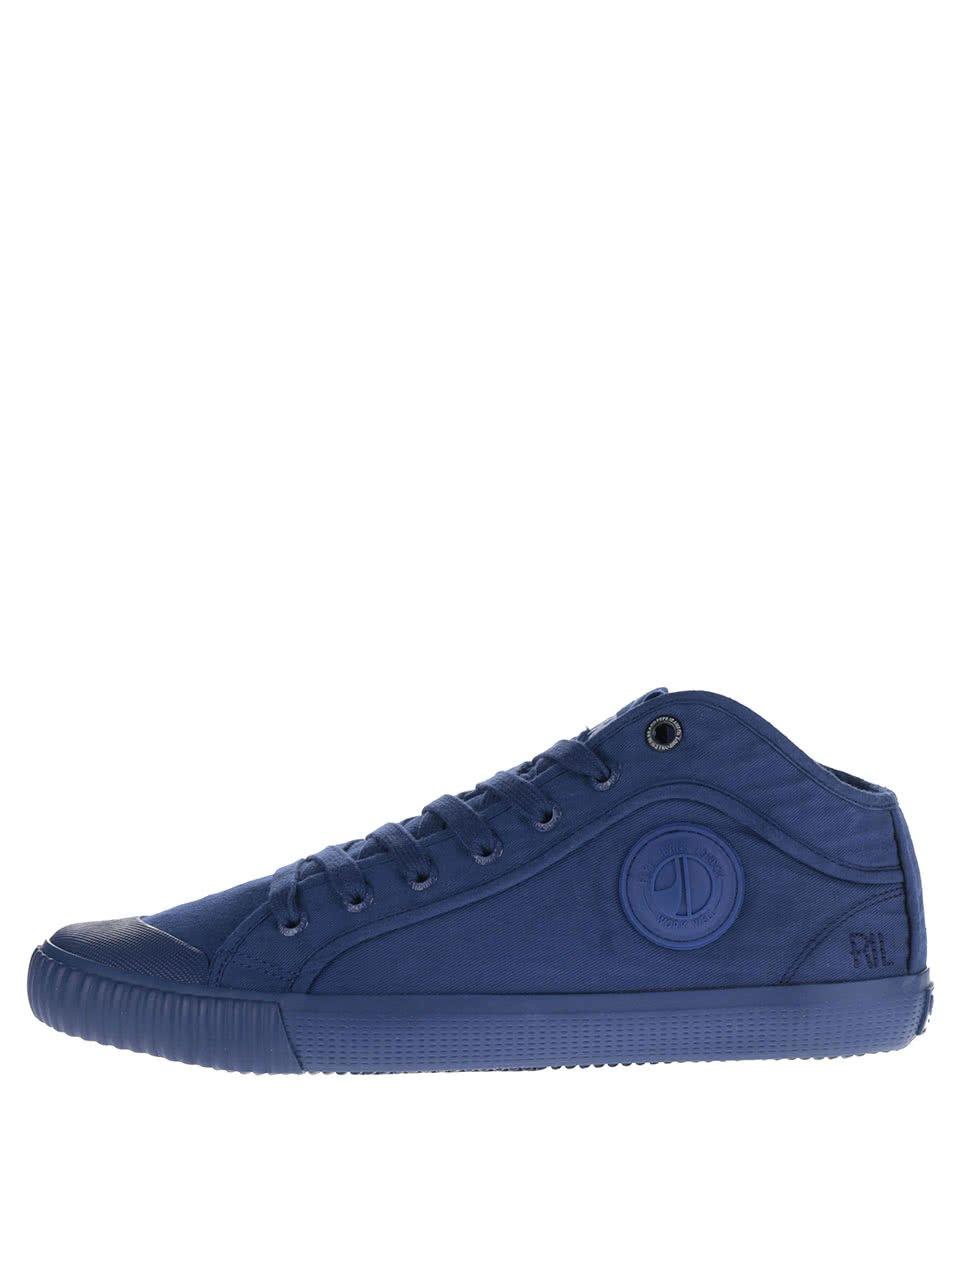 Modré pánské tenisky Pepe Jeans Industry Routes